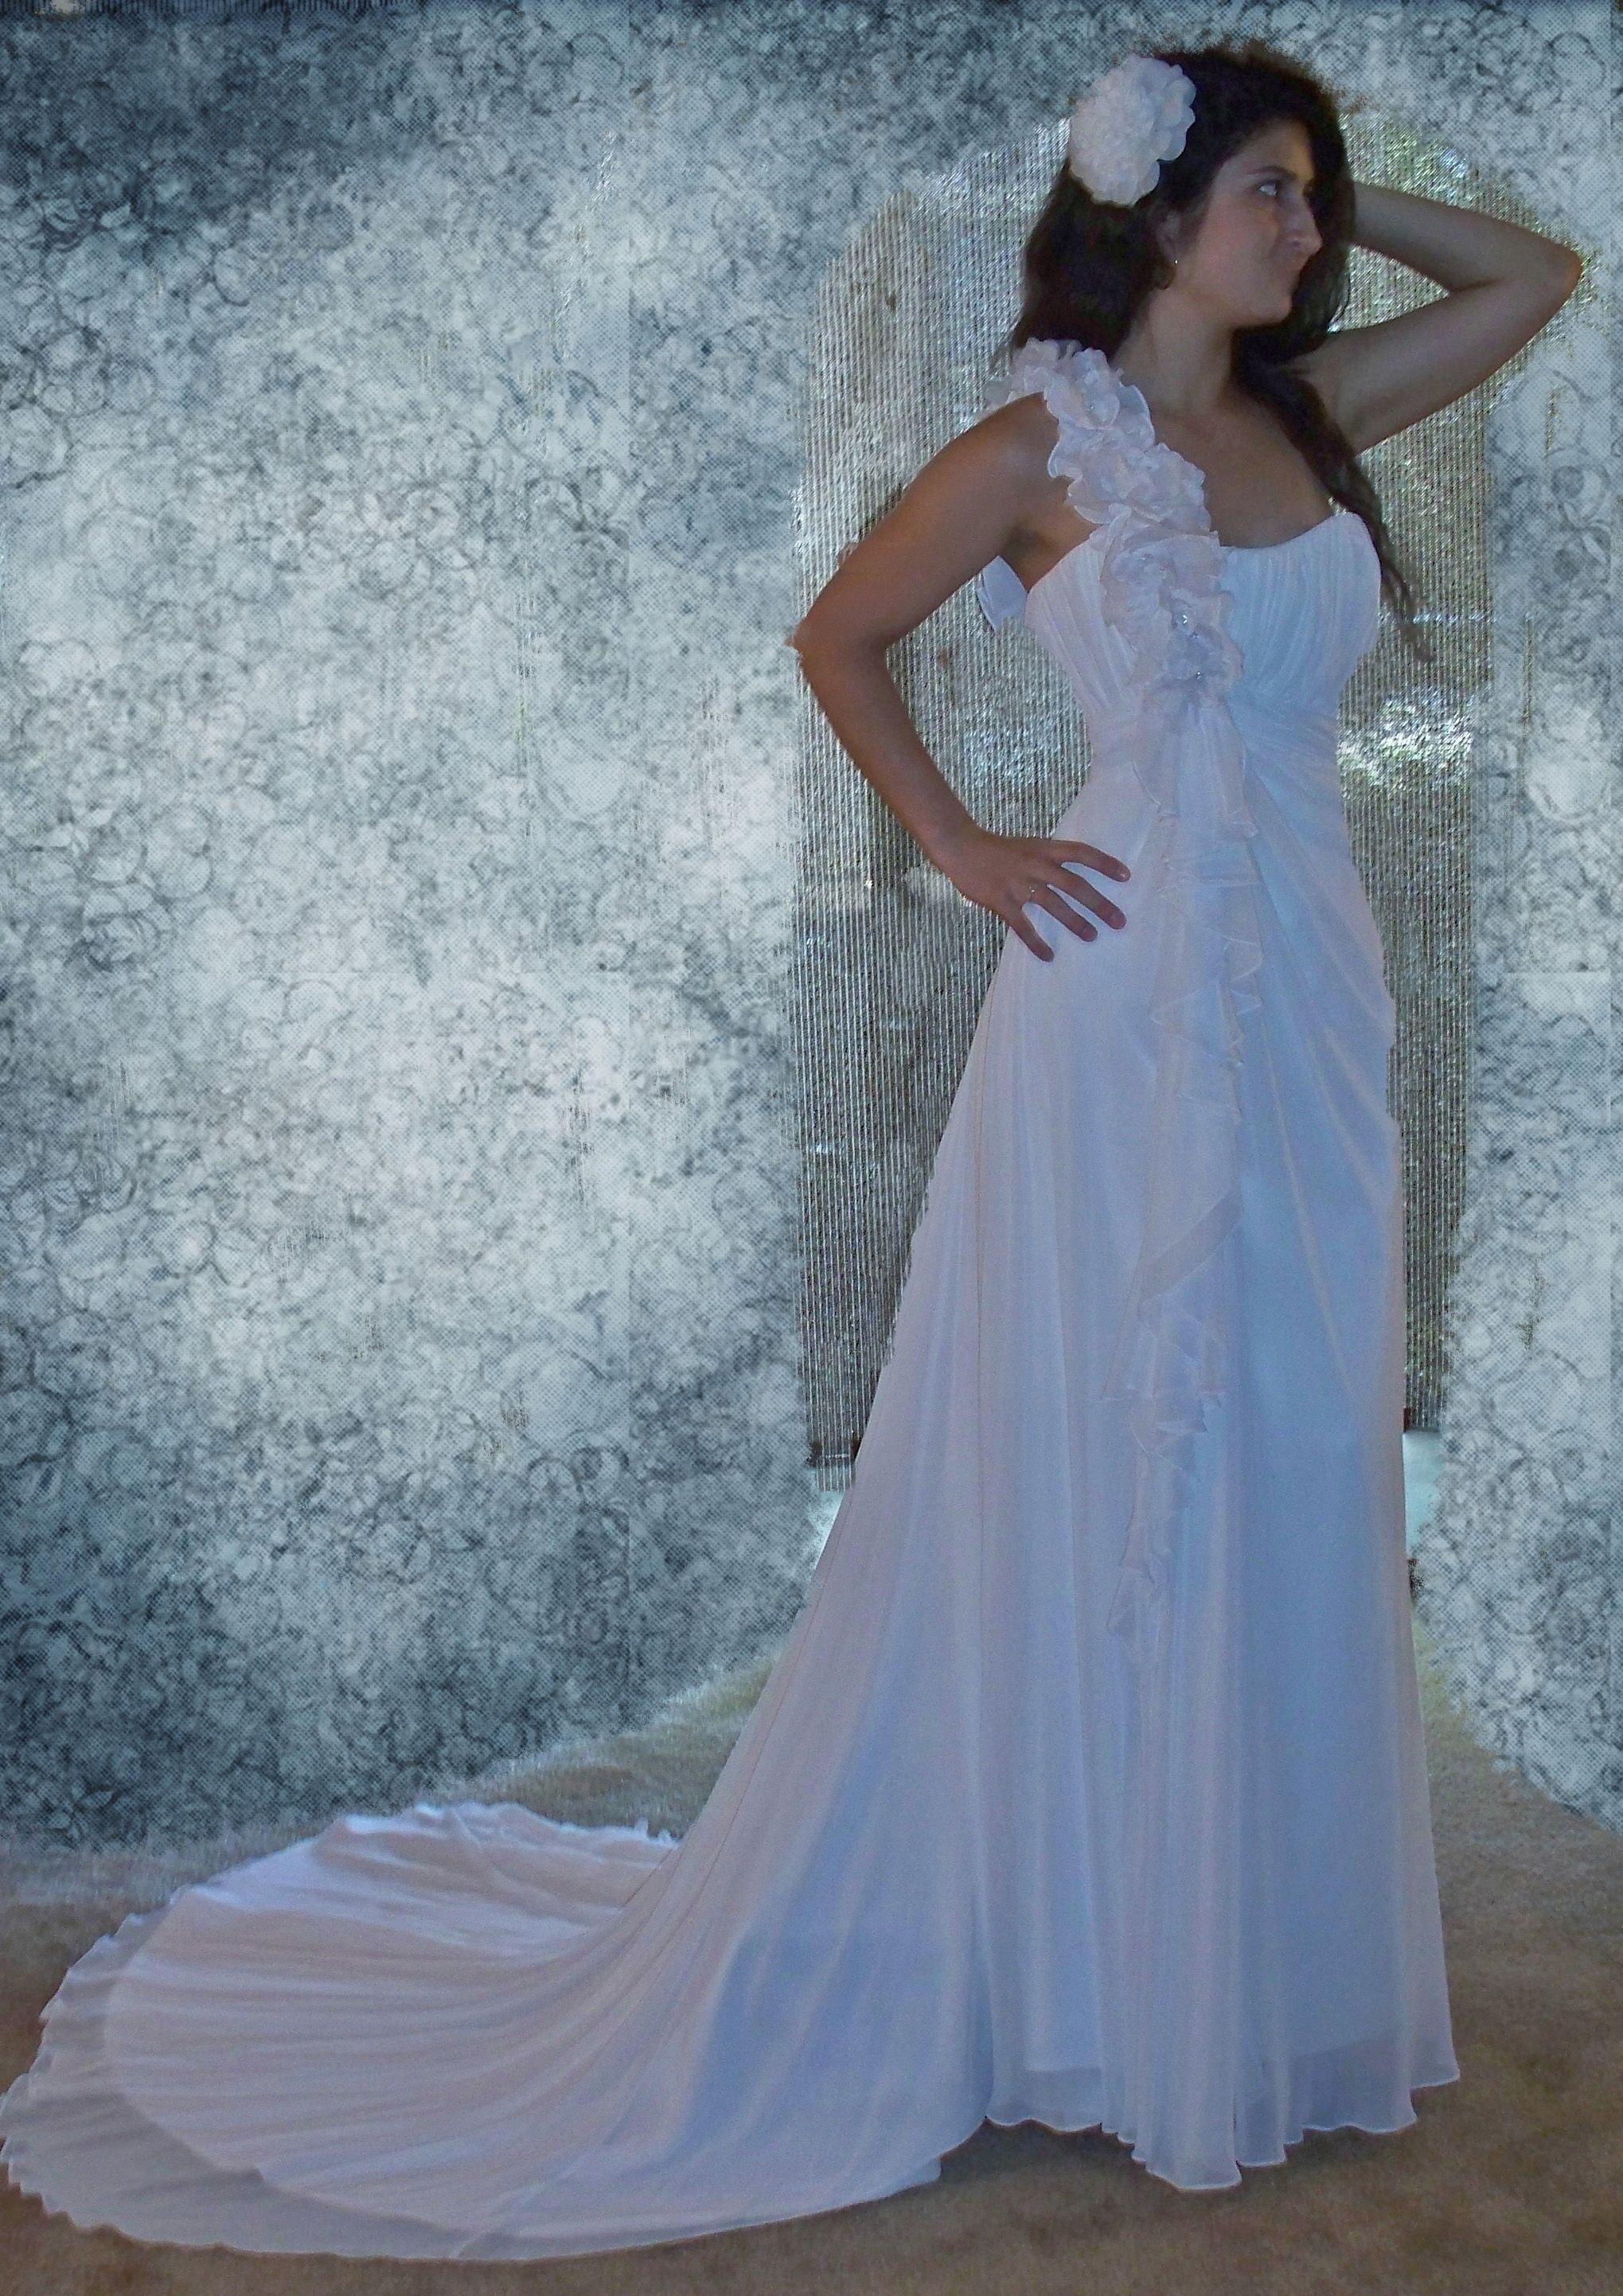 Maggie Sottero Wedding Dress. Maggie Sottero Wedding Dress on ...